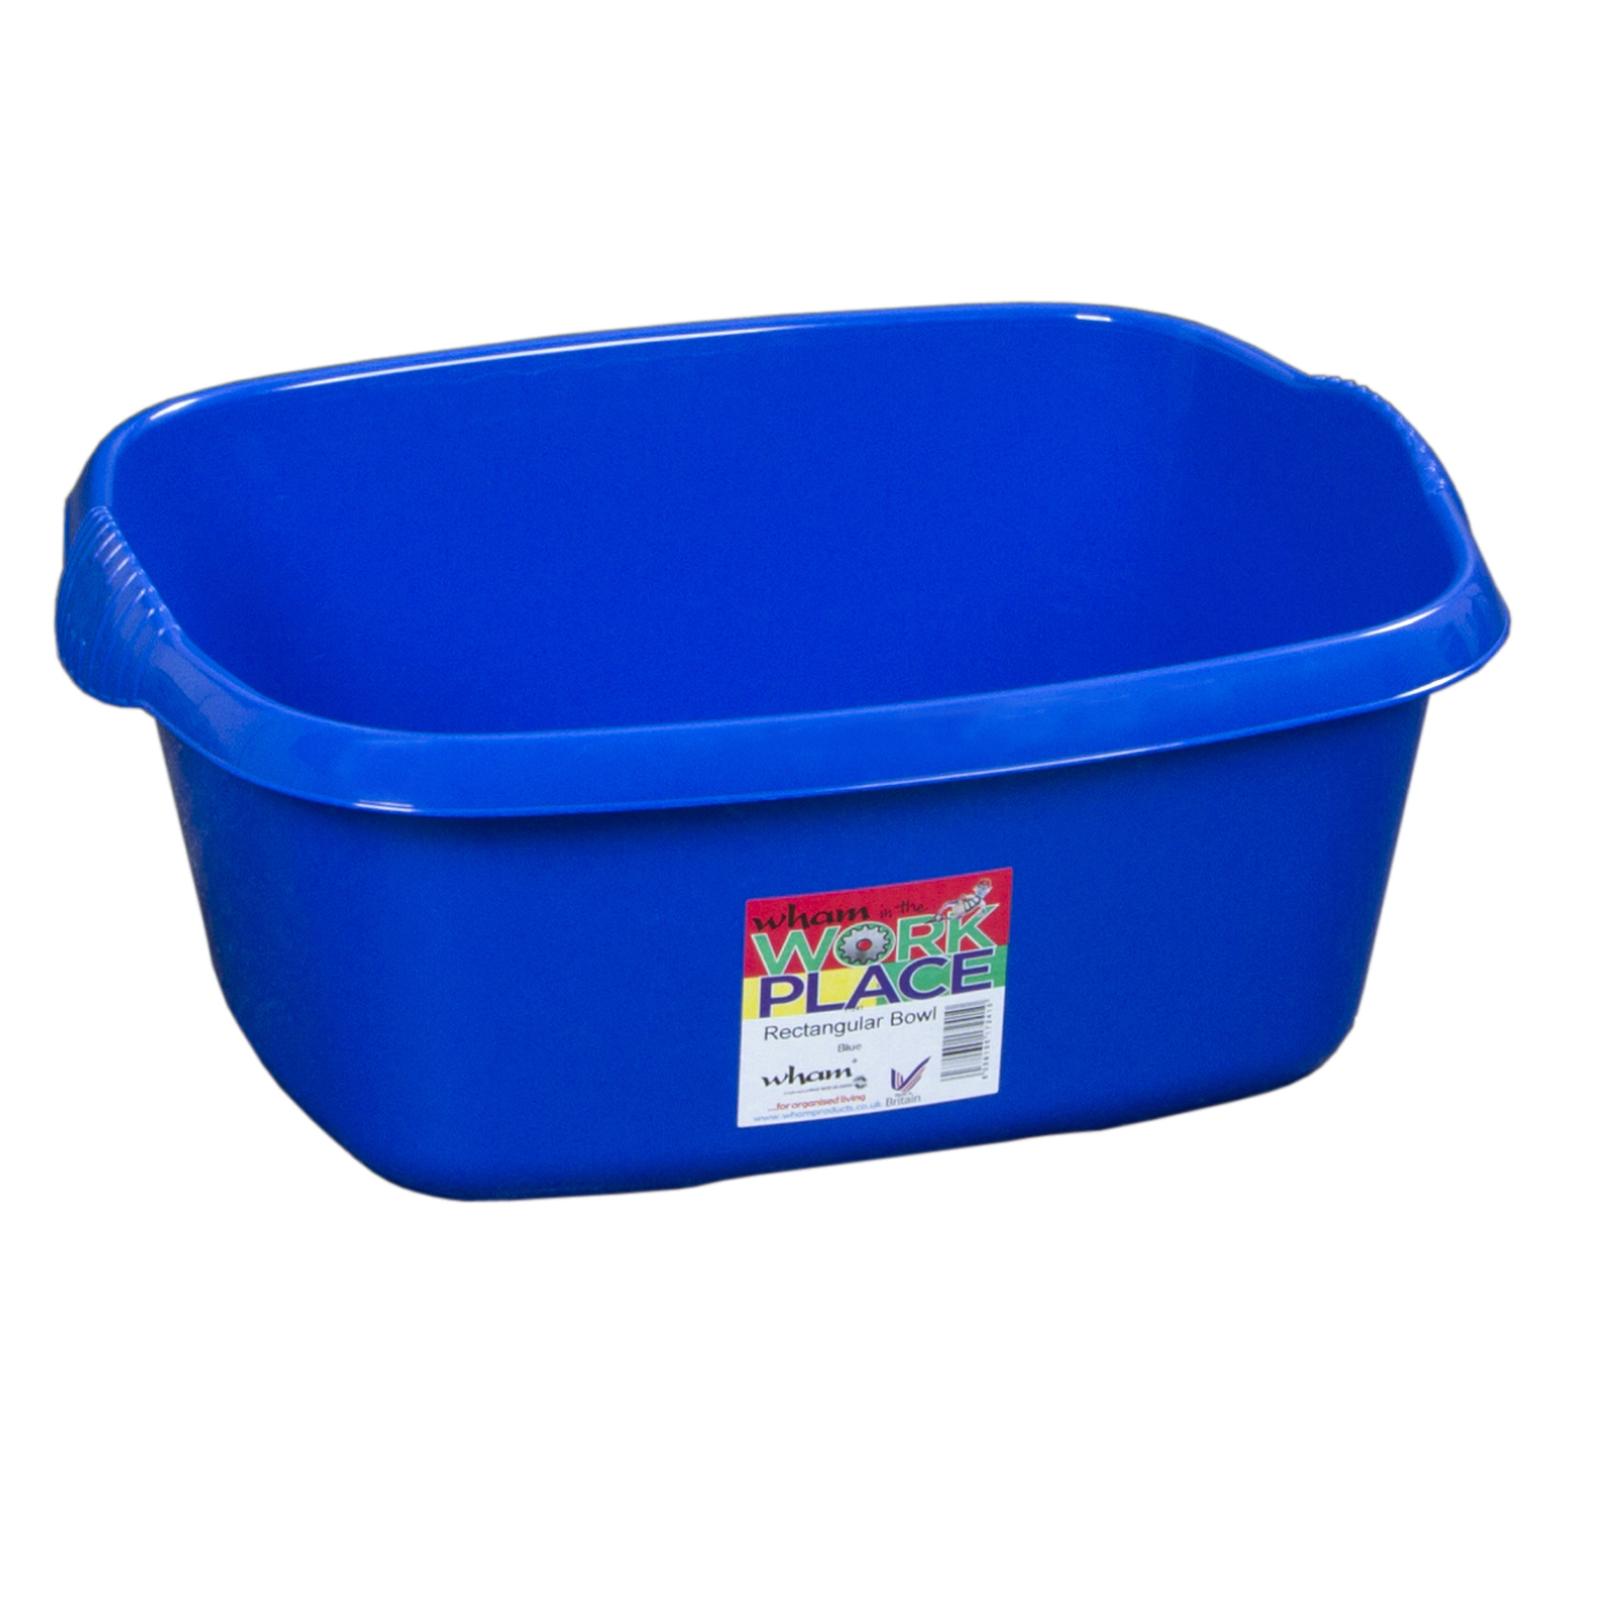 Spuelschuessel-Waschschuessel-Plastikschuessel-Kunststoff-Schuessel-Camping-Spuele-12L